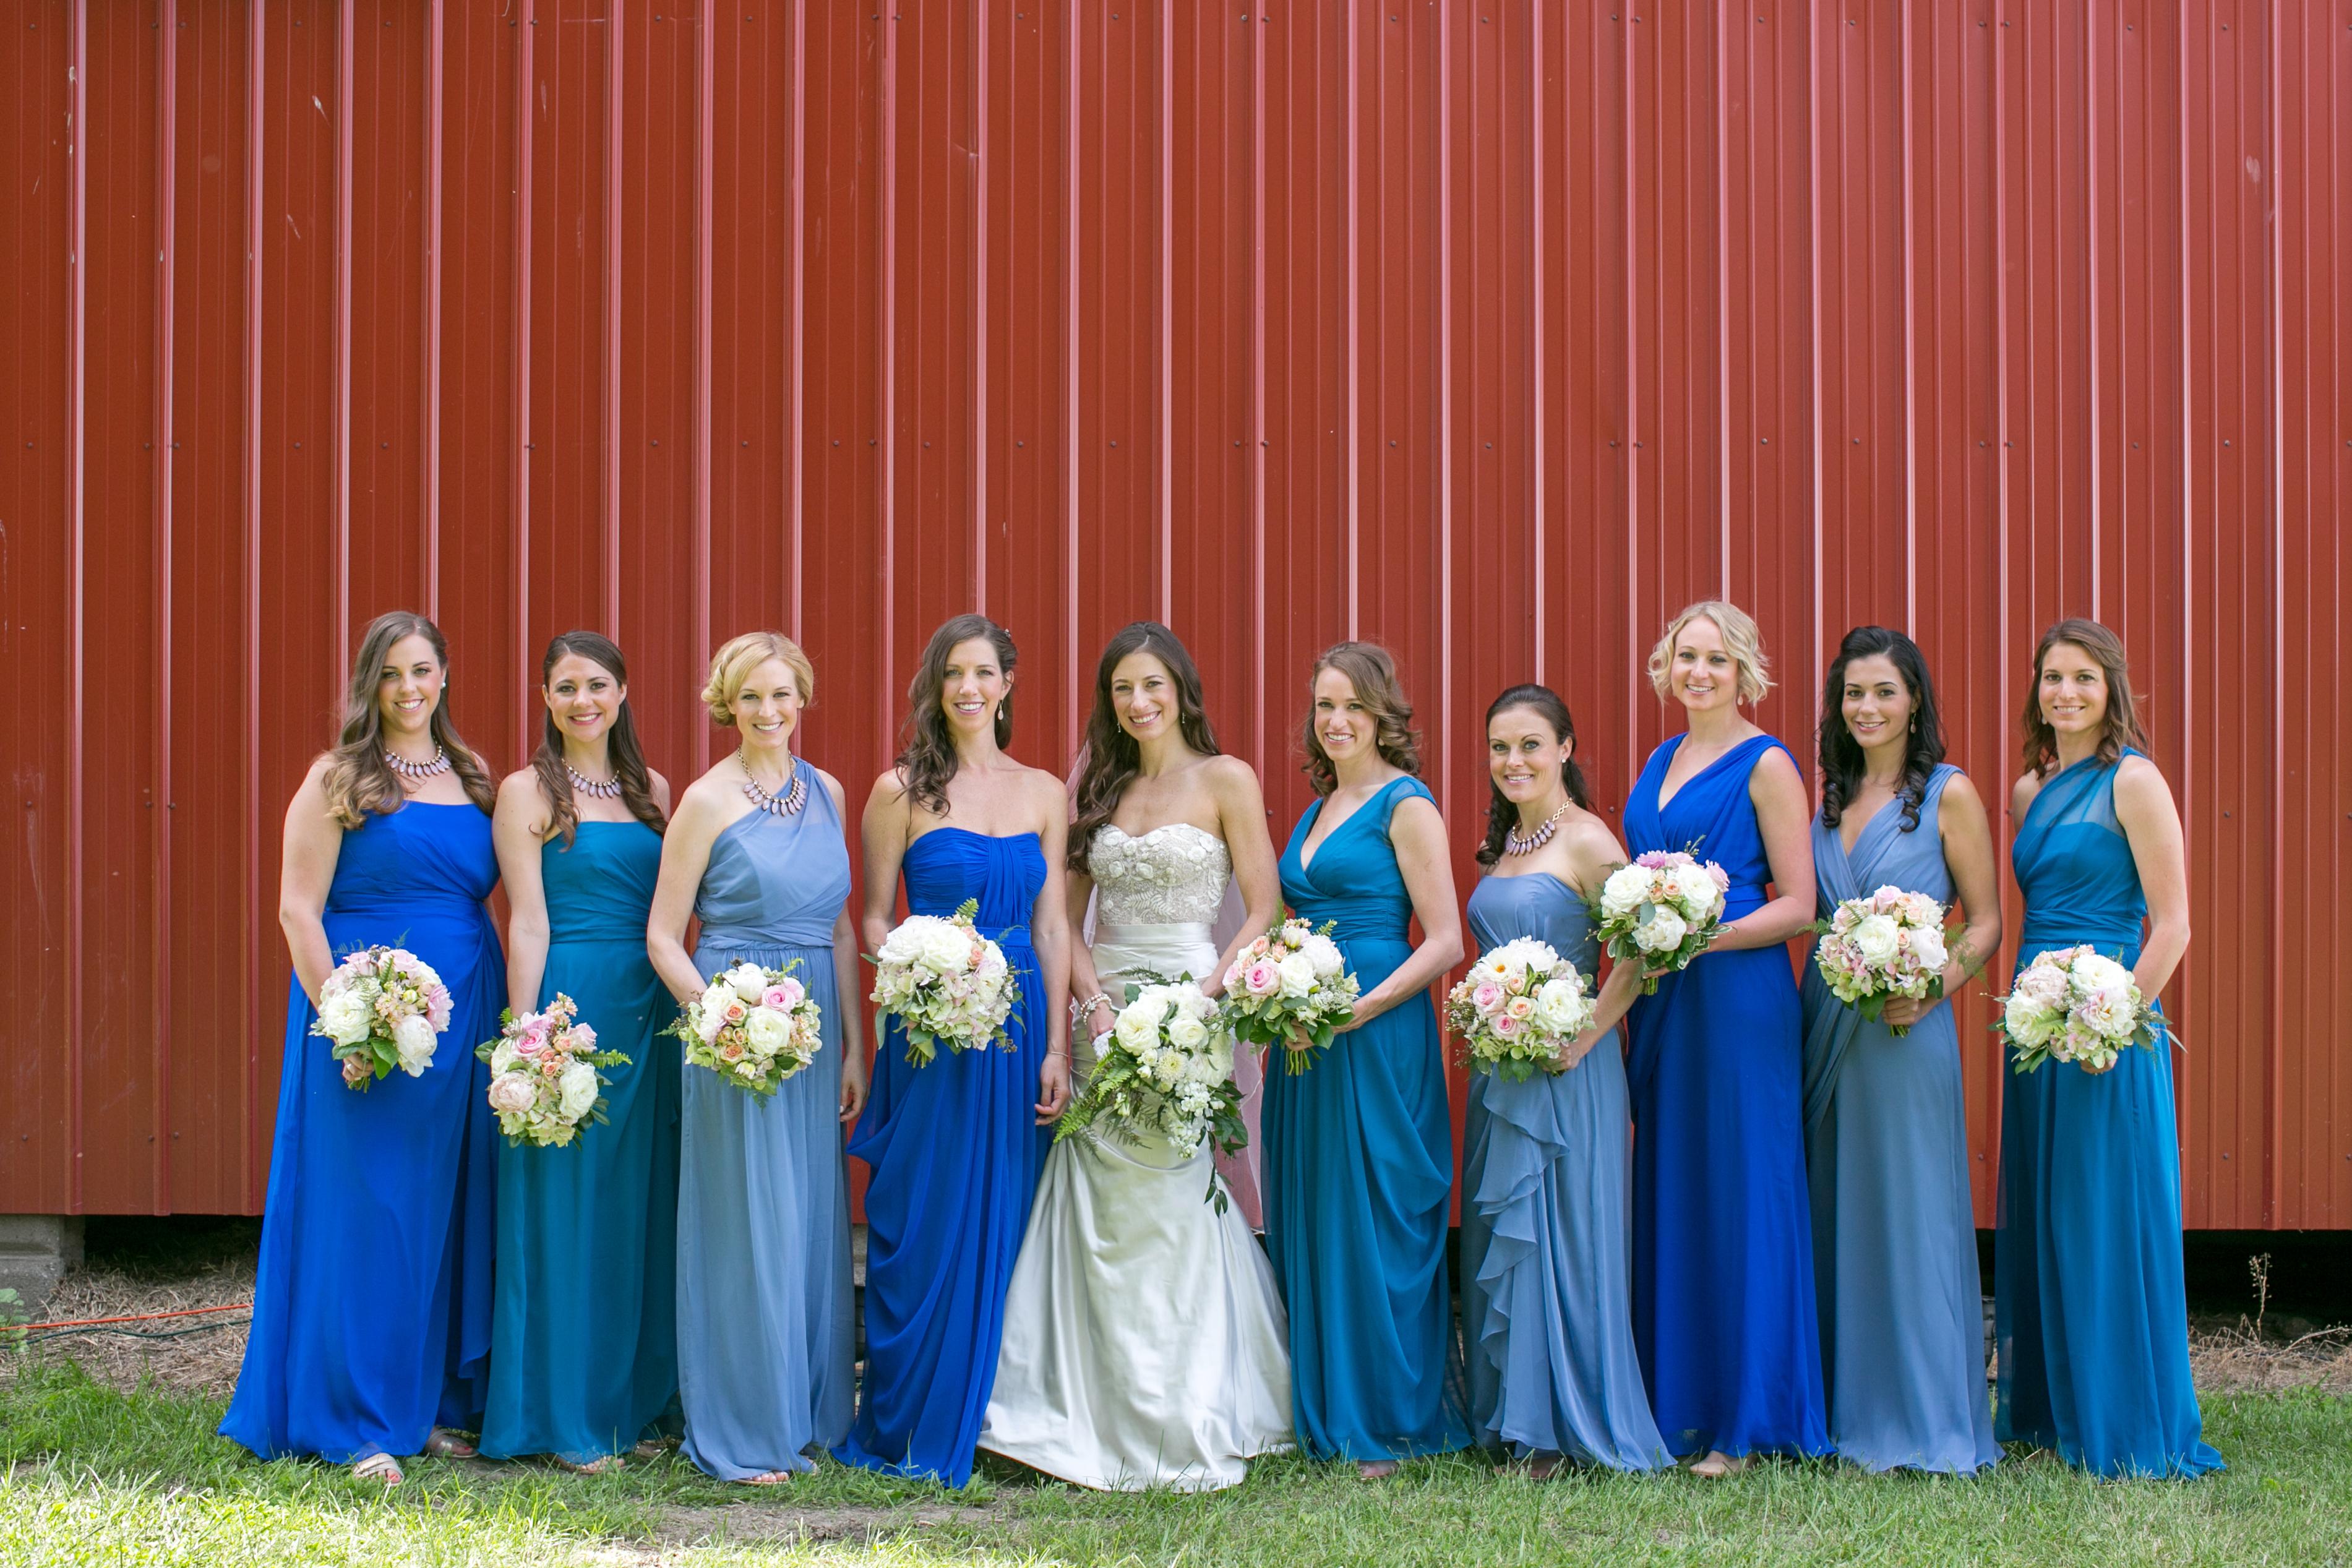 Wedding Invitations | Mon Amie Events Inc. | Indianapolis Weddings ...